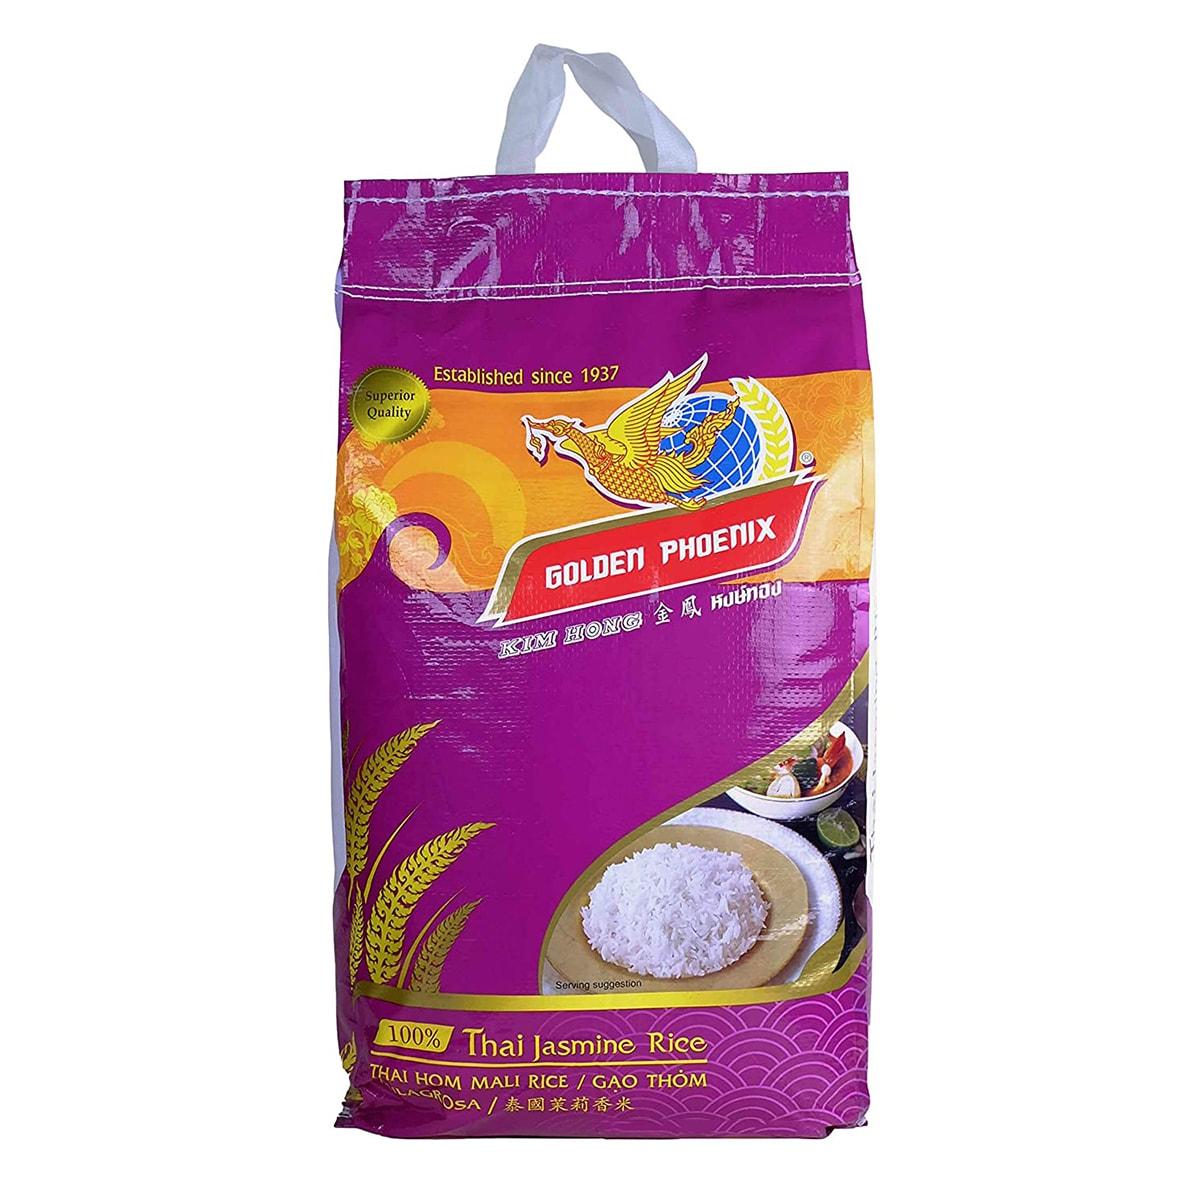 Buy Golden Phoenix Thai Jasmine Rice - 20 kg